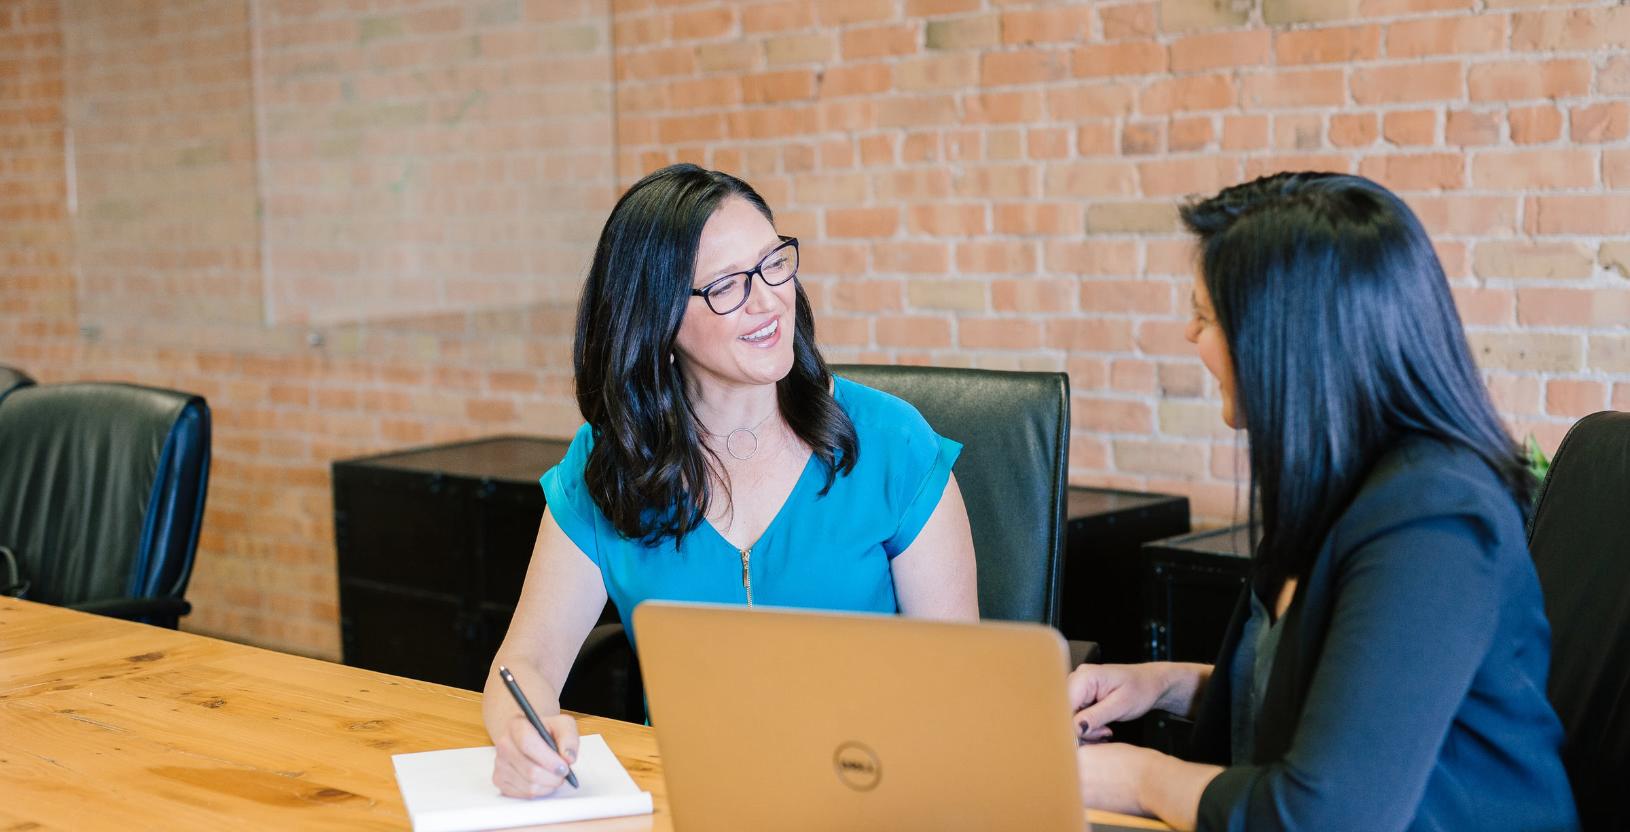 Woman in teal t-shirt sitting beside an insurance broker